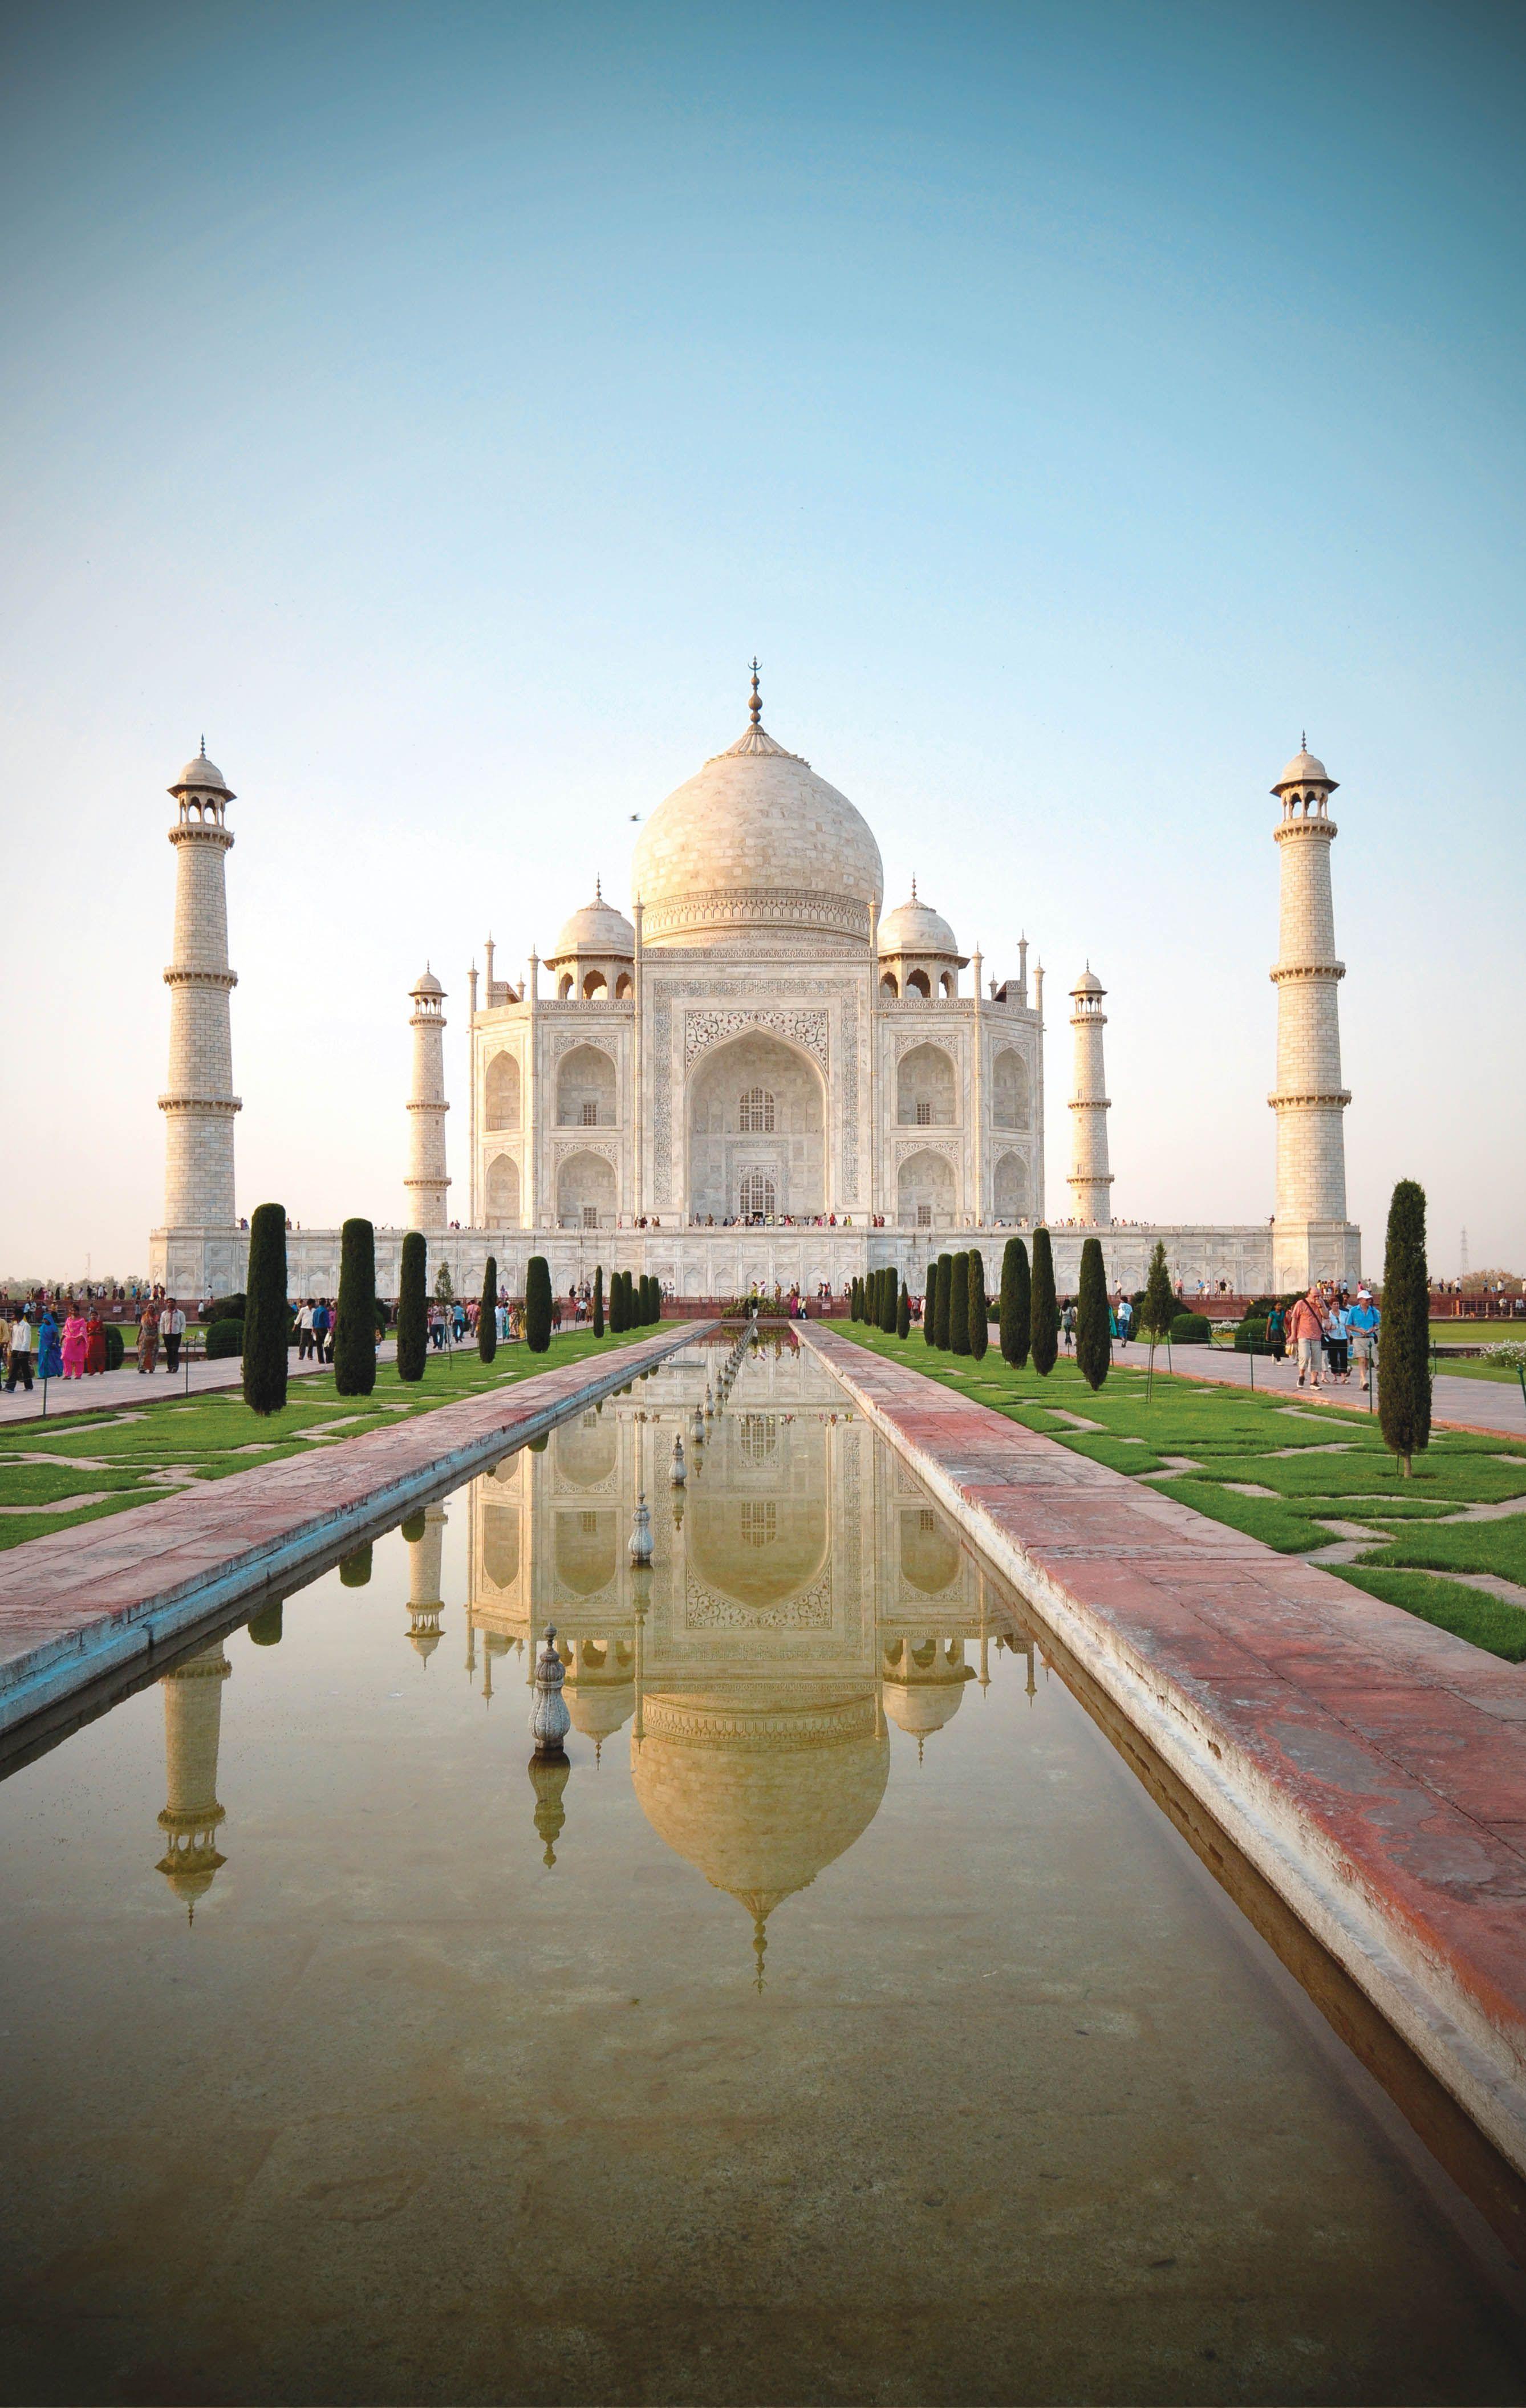 The serene Taj Mahal in Agra, India. Photo by Angela Strangis